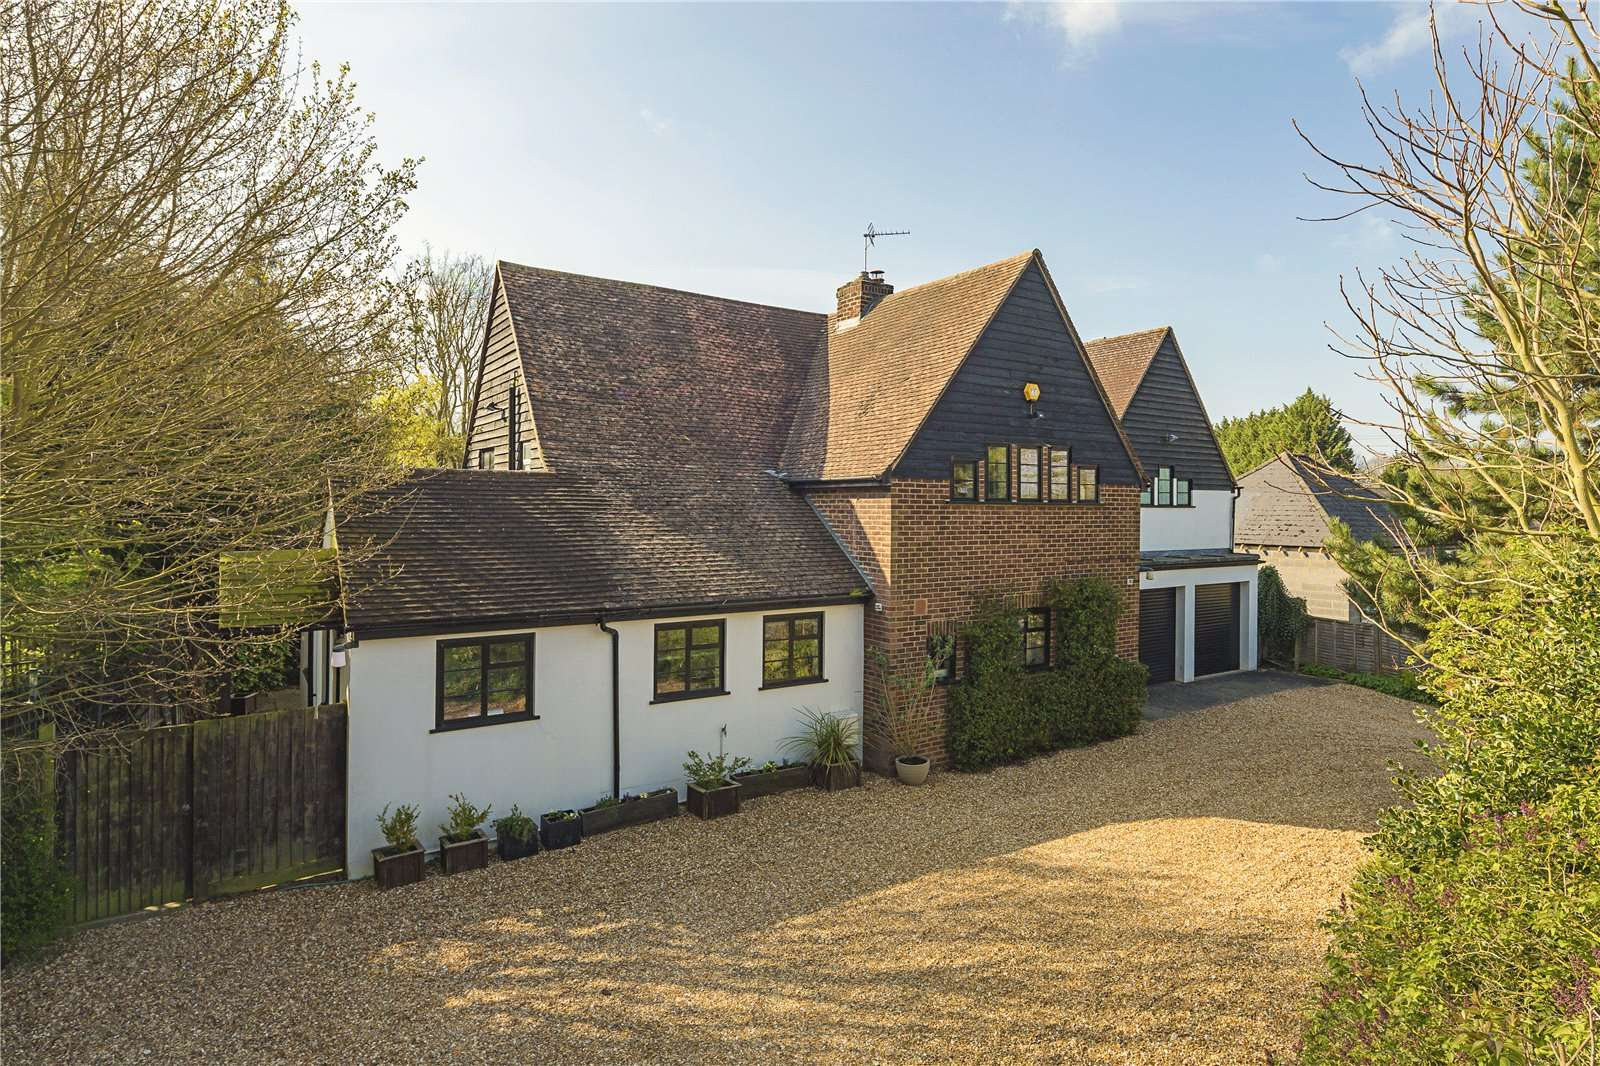 North End Meldreth Royston Hertfordshire Sg8 6nr Properties For Sale Savills